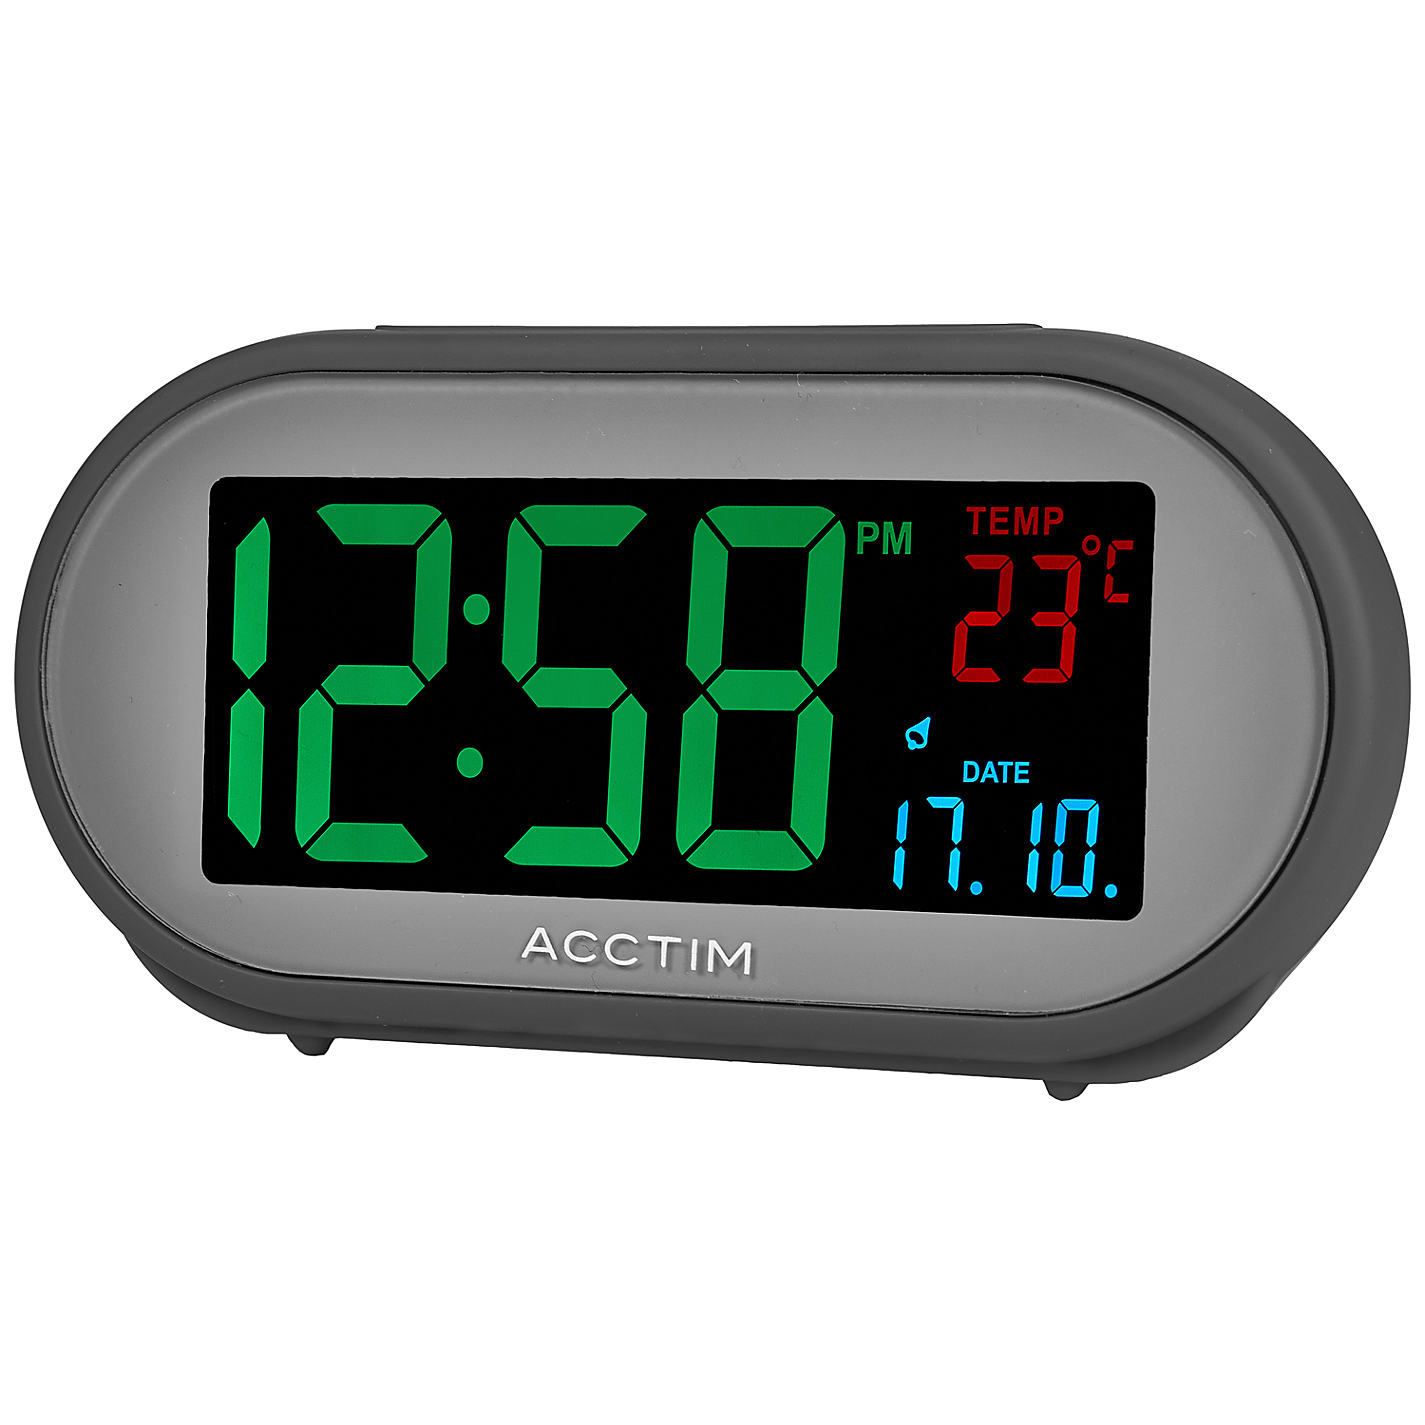 lcd alarm clocks unique alarm clock. Black Bedroom Furniture Sets. Home Design Ideas